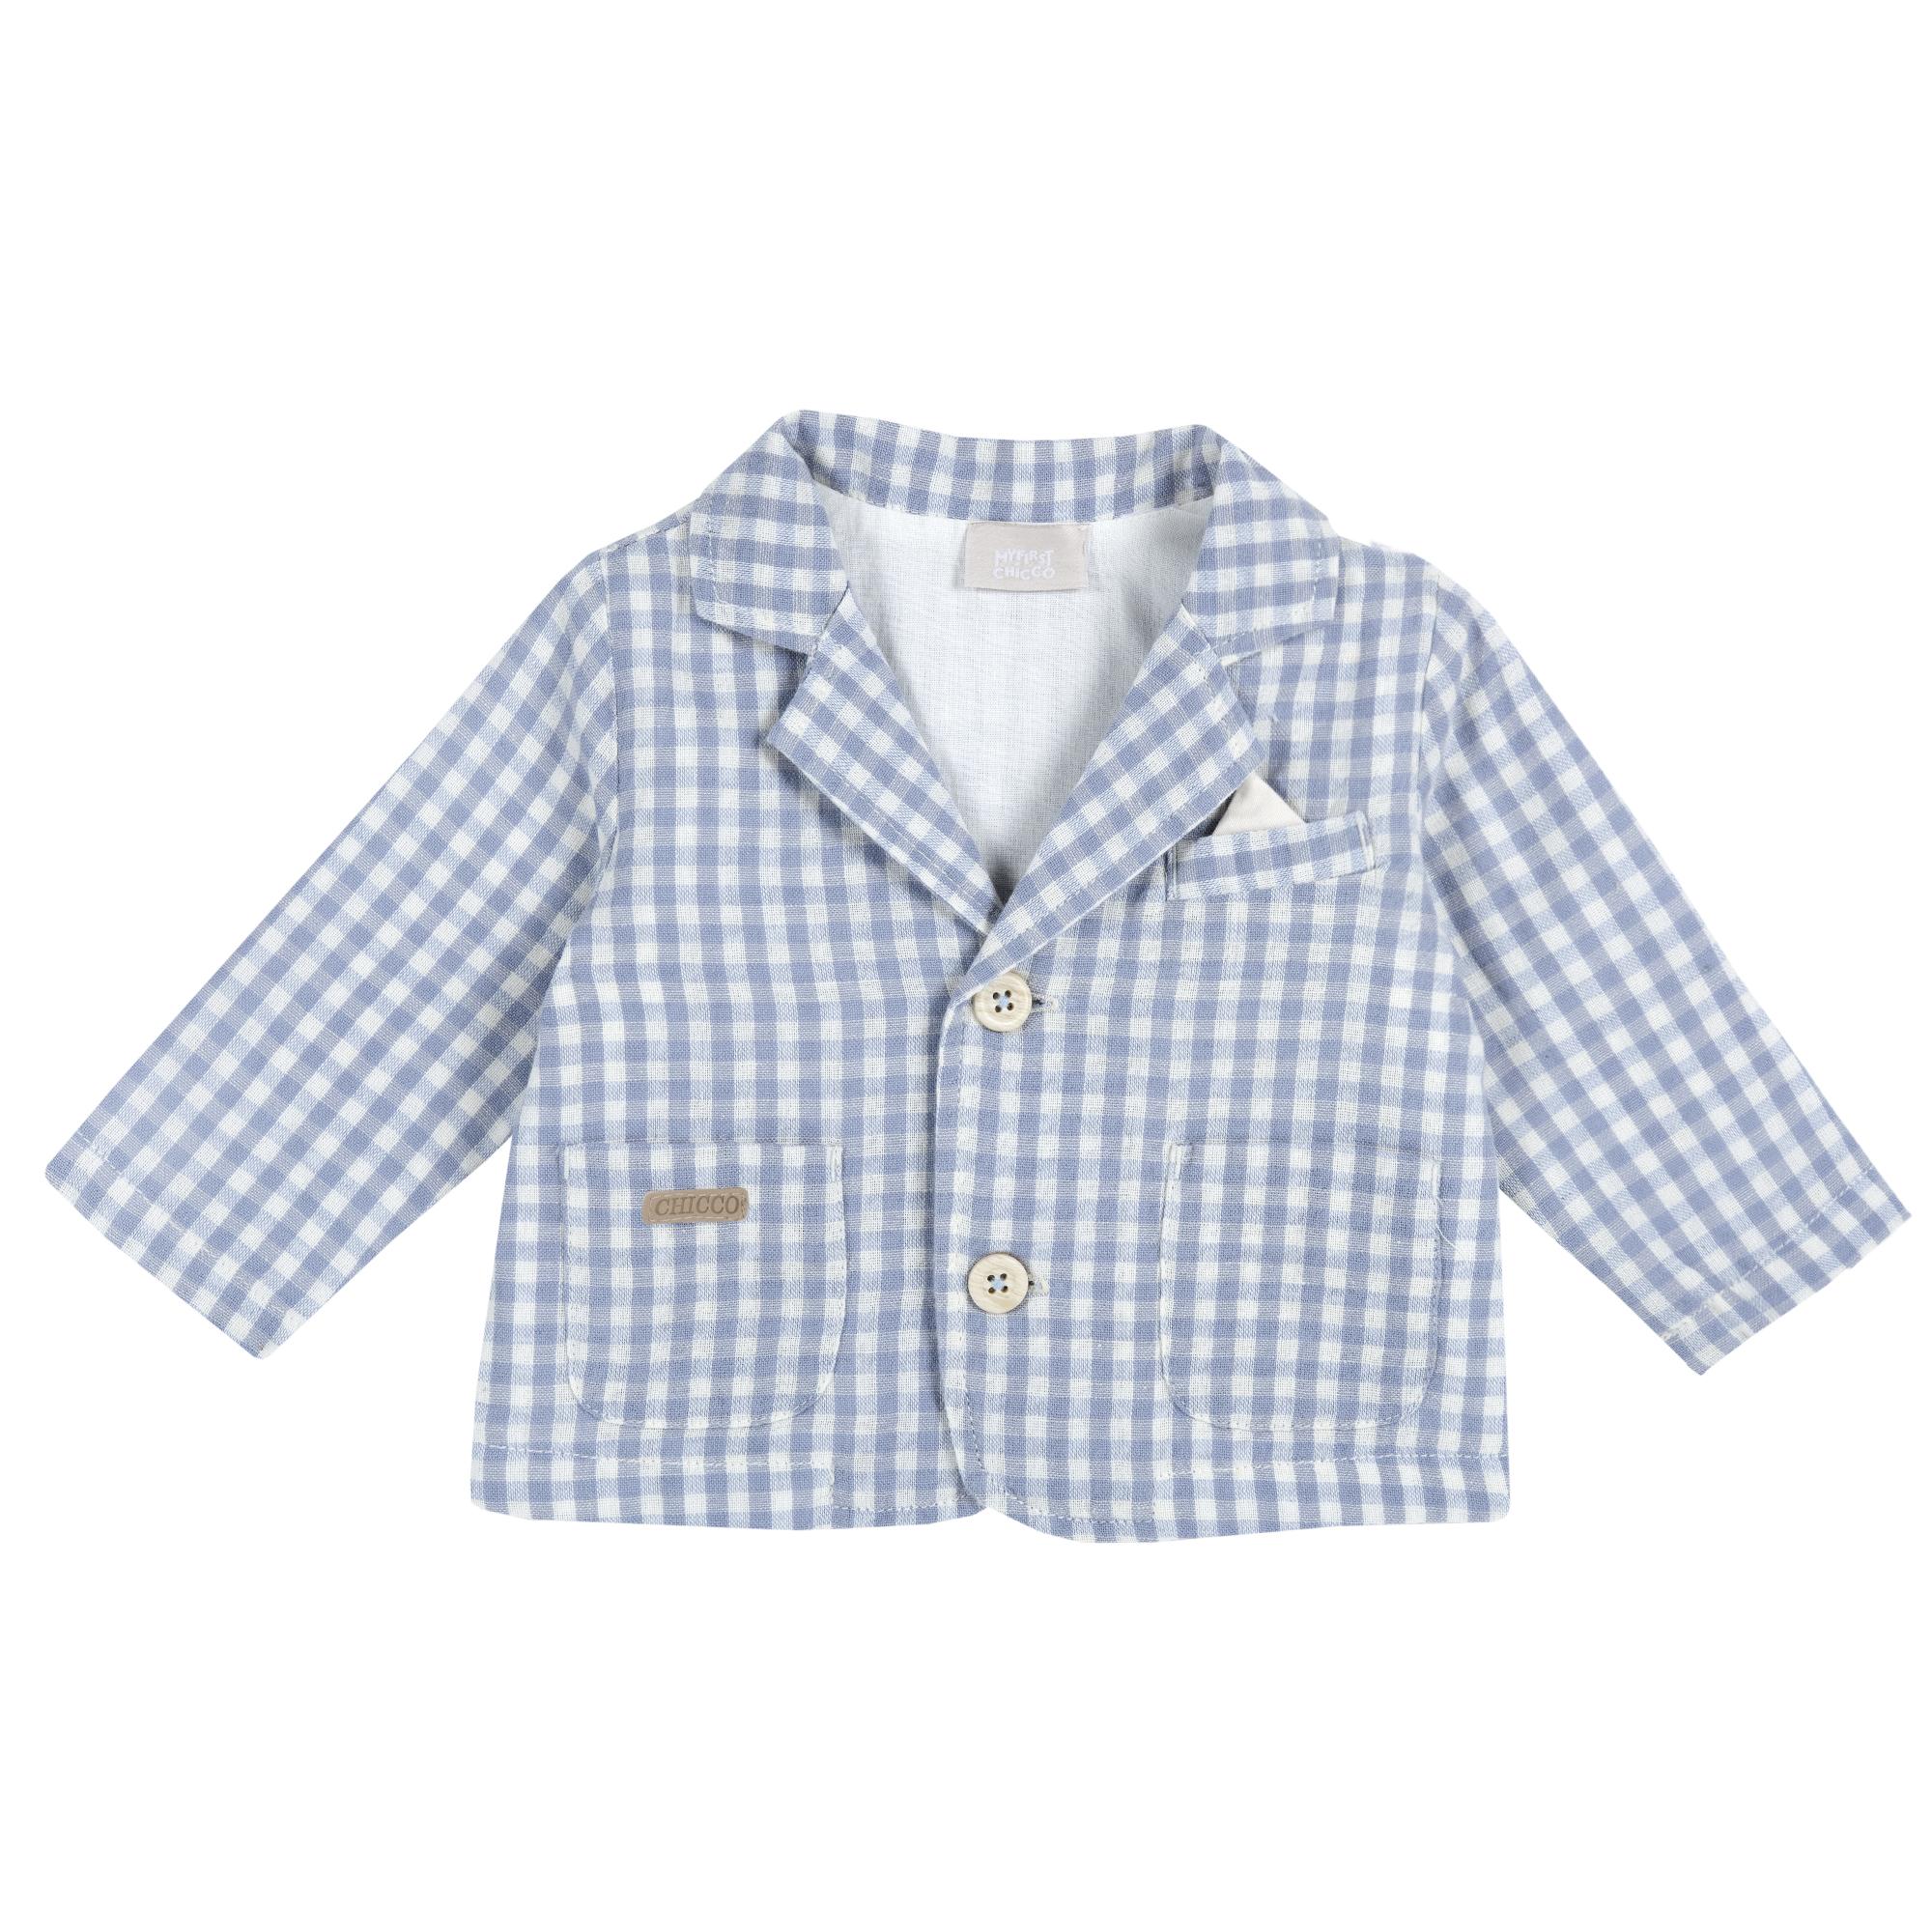 Jacheta Tip Sacou Copii Chicco, Alb Cu Bleu, 84345 imagine